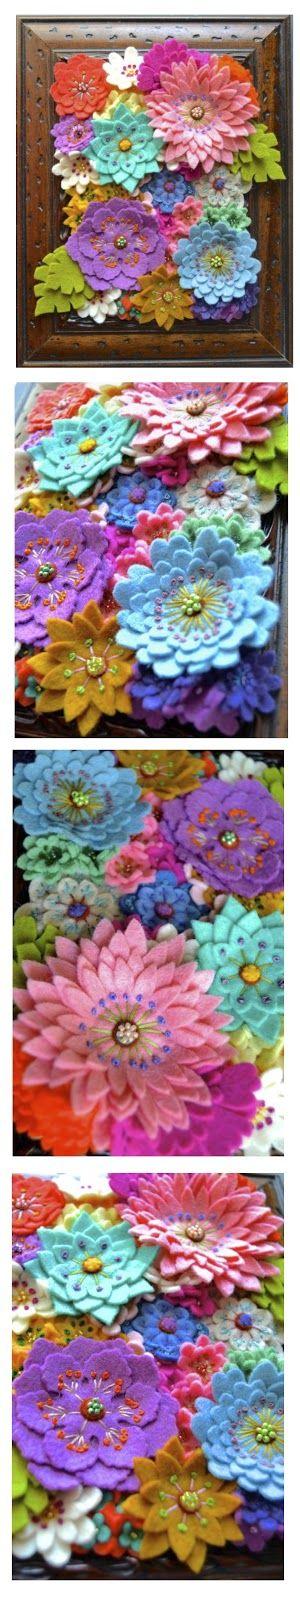 IKUKO FUJII: Cuadro de flores de fieltro. Flower painting with felt. フェルトの花の絵画